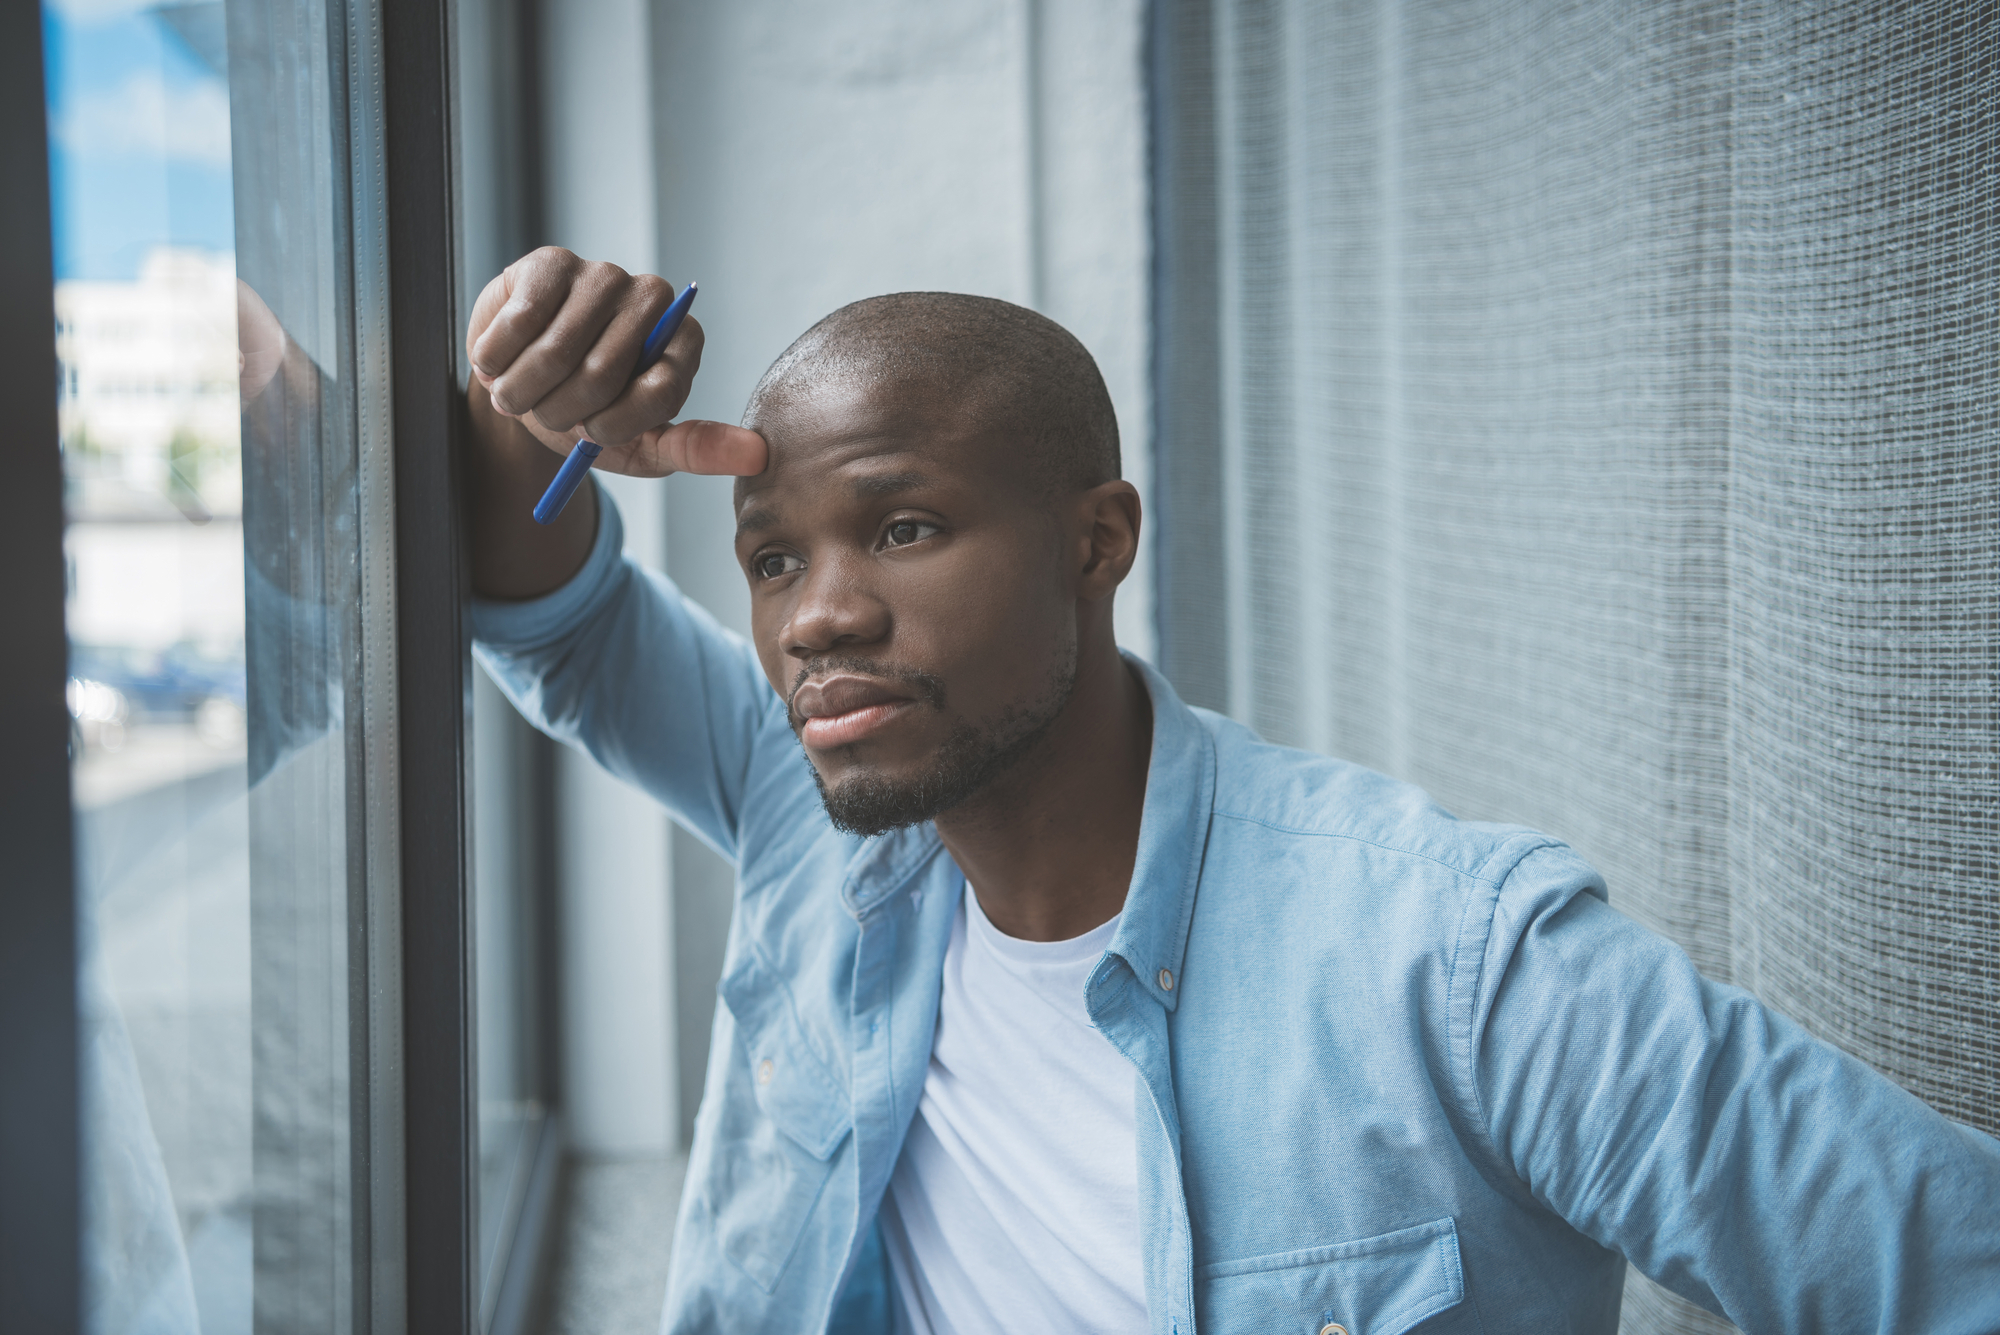 African american man looking at window